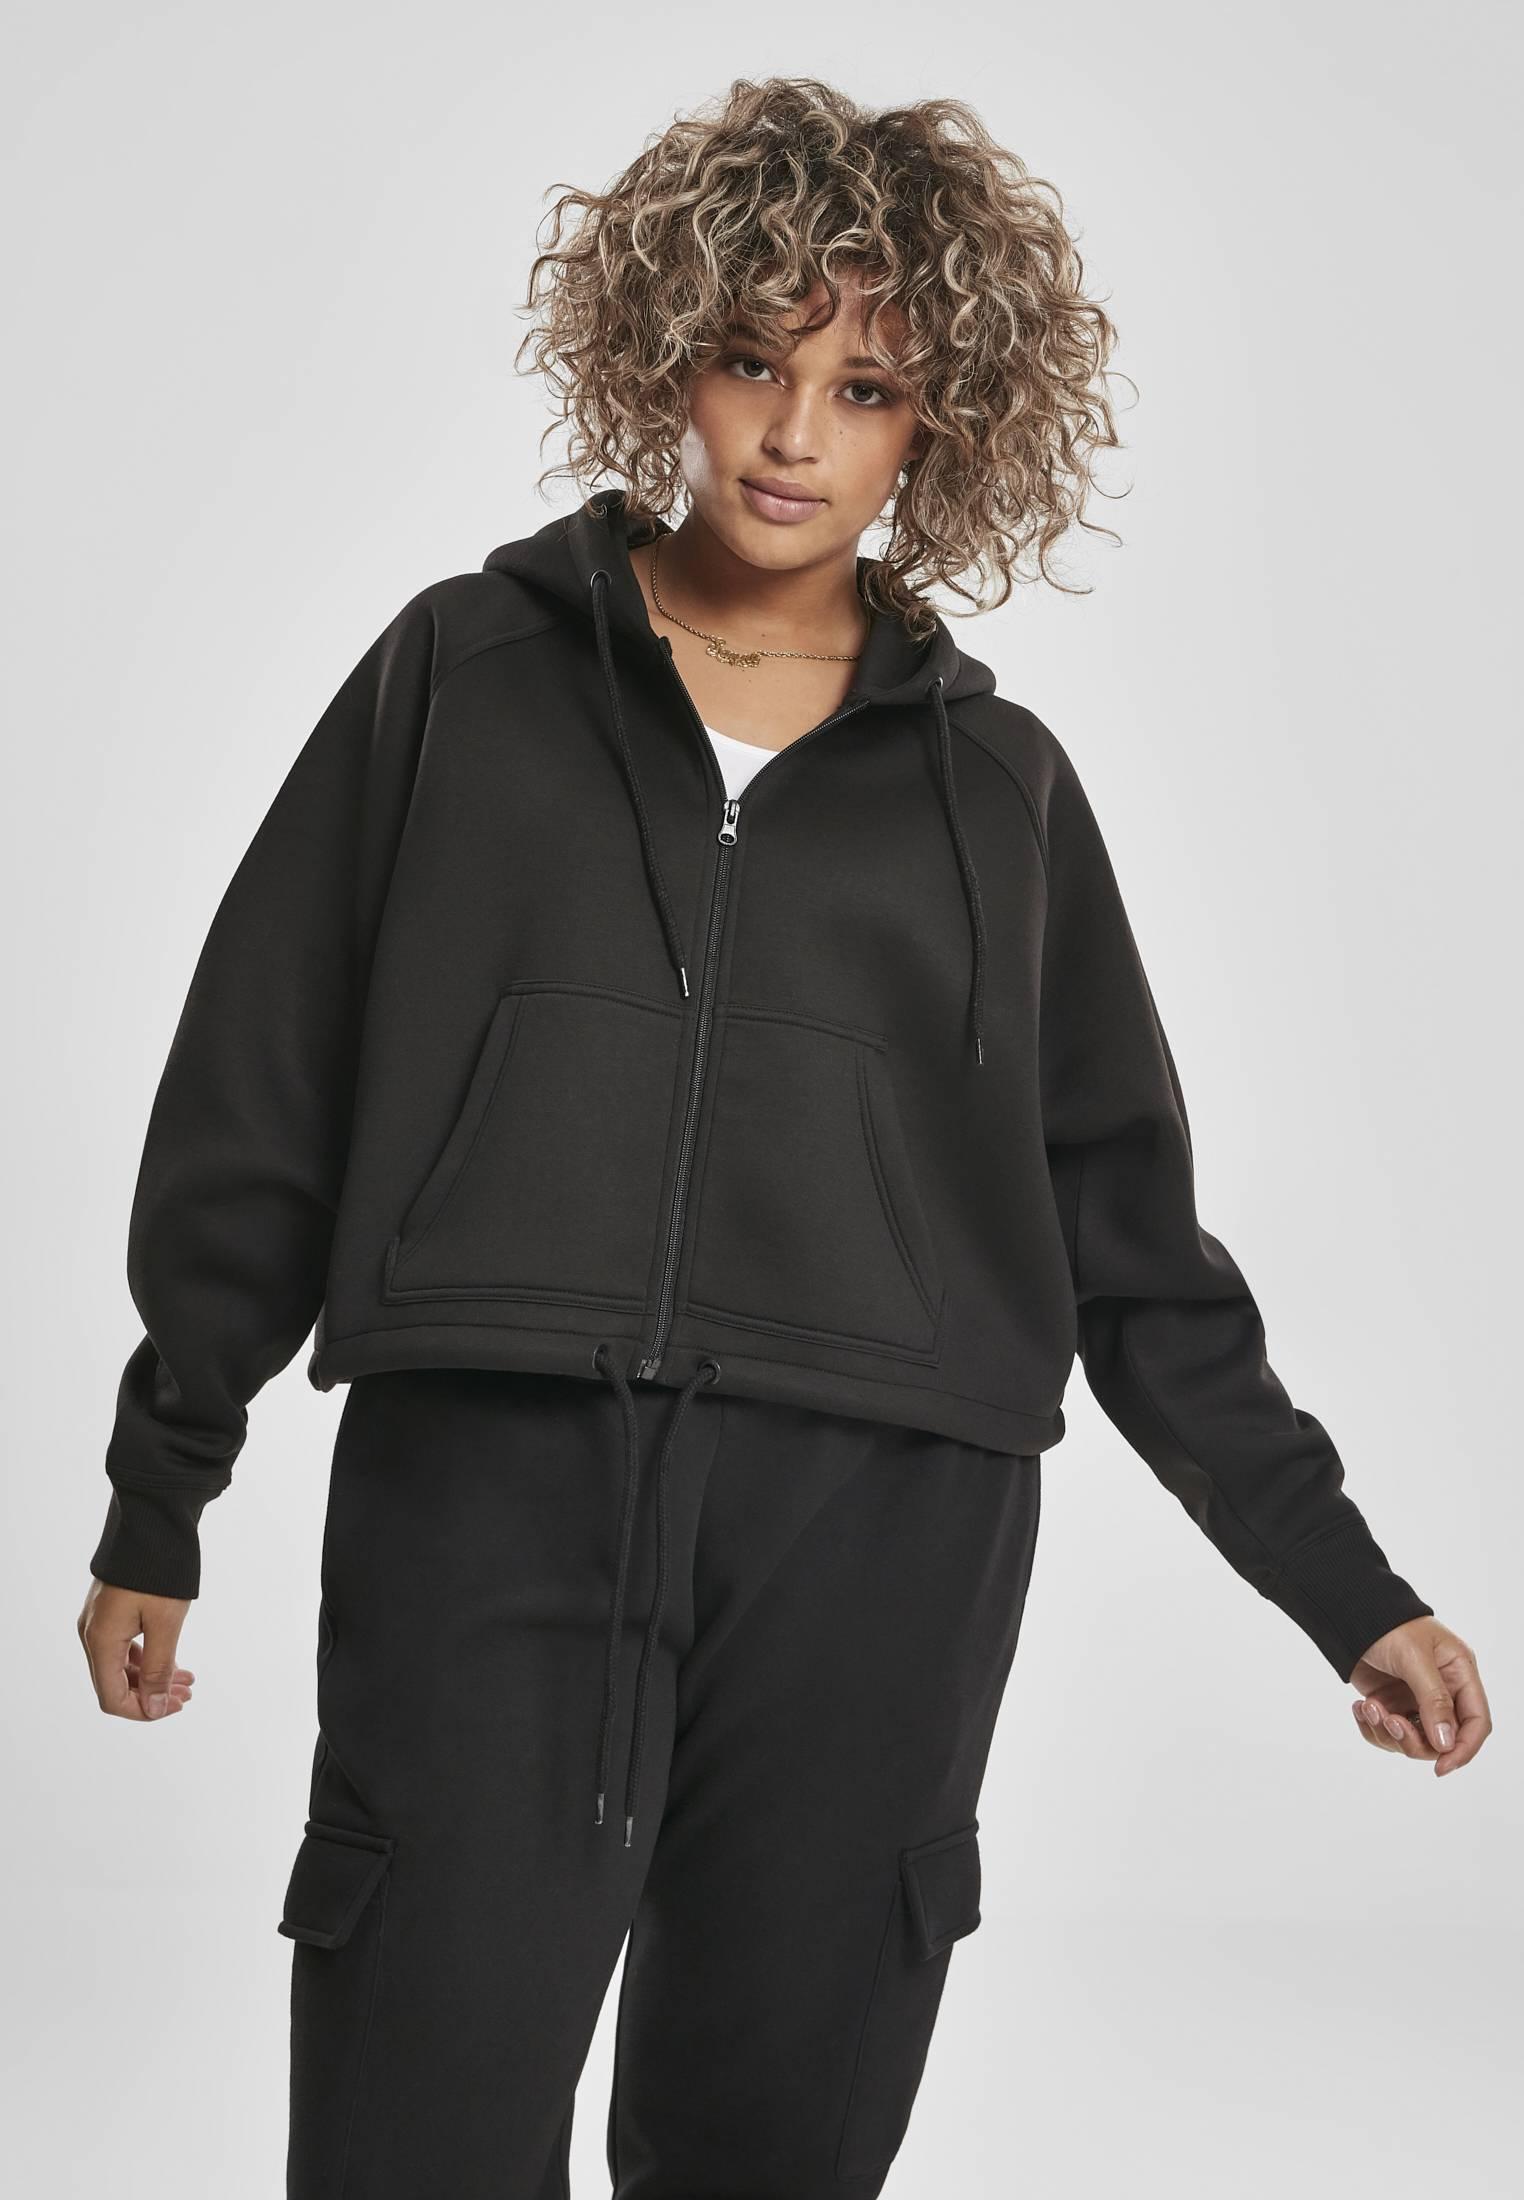 Urban Classics Ladies Oversized Short Raglan Zip Hoody black - 3XL